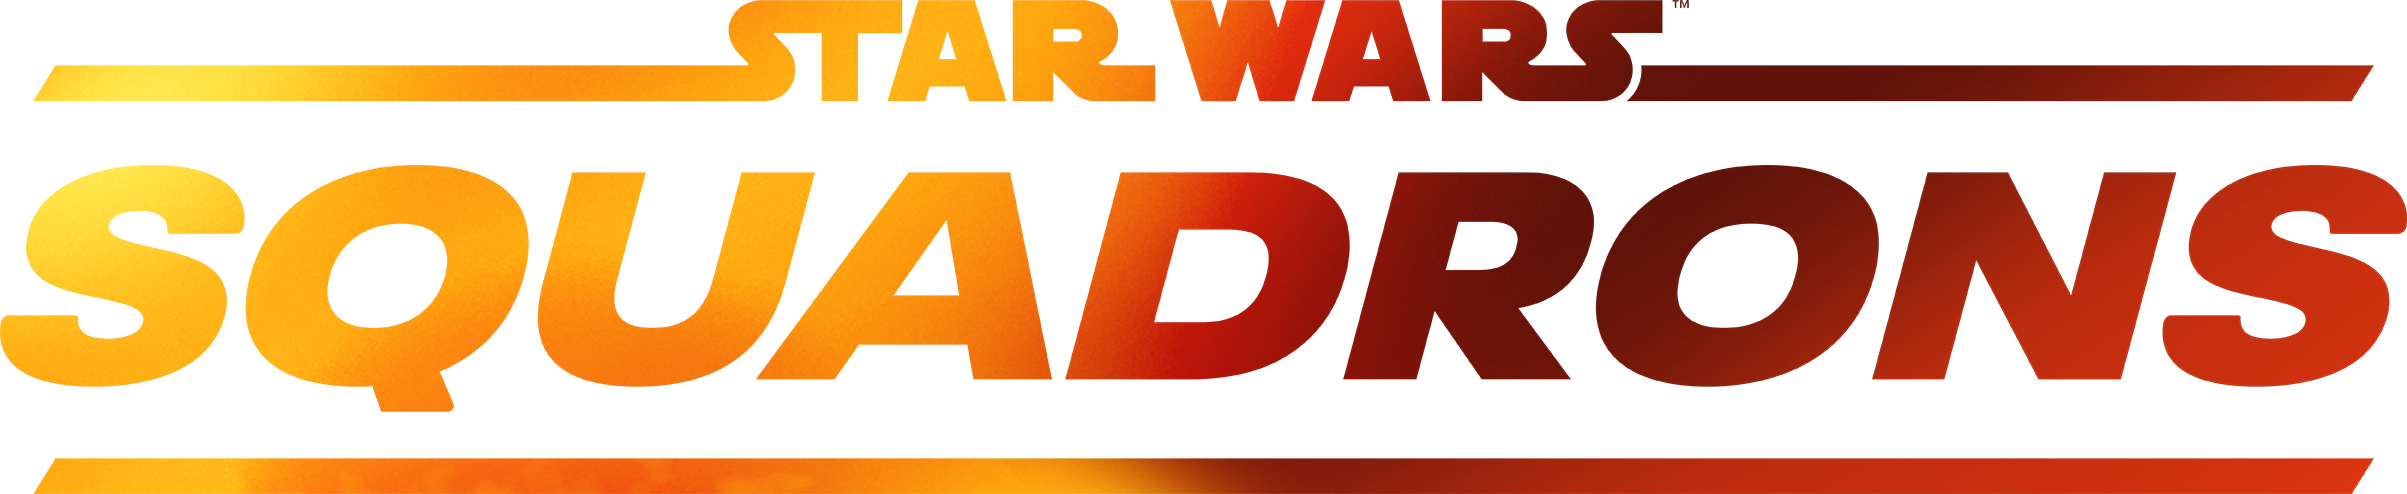 Star Wars: Squadrons logo